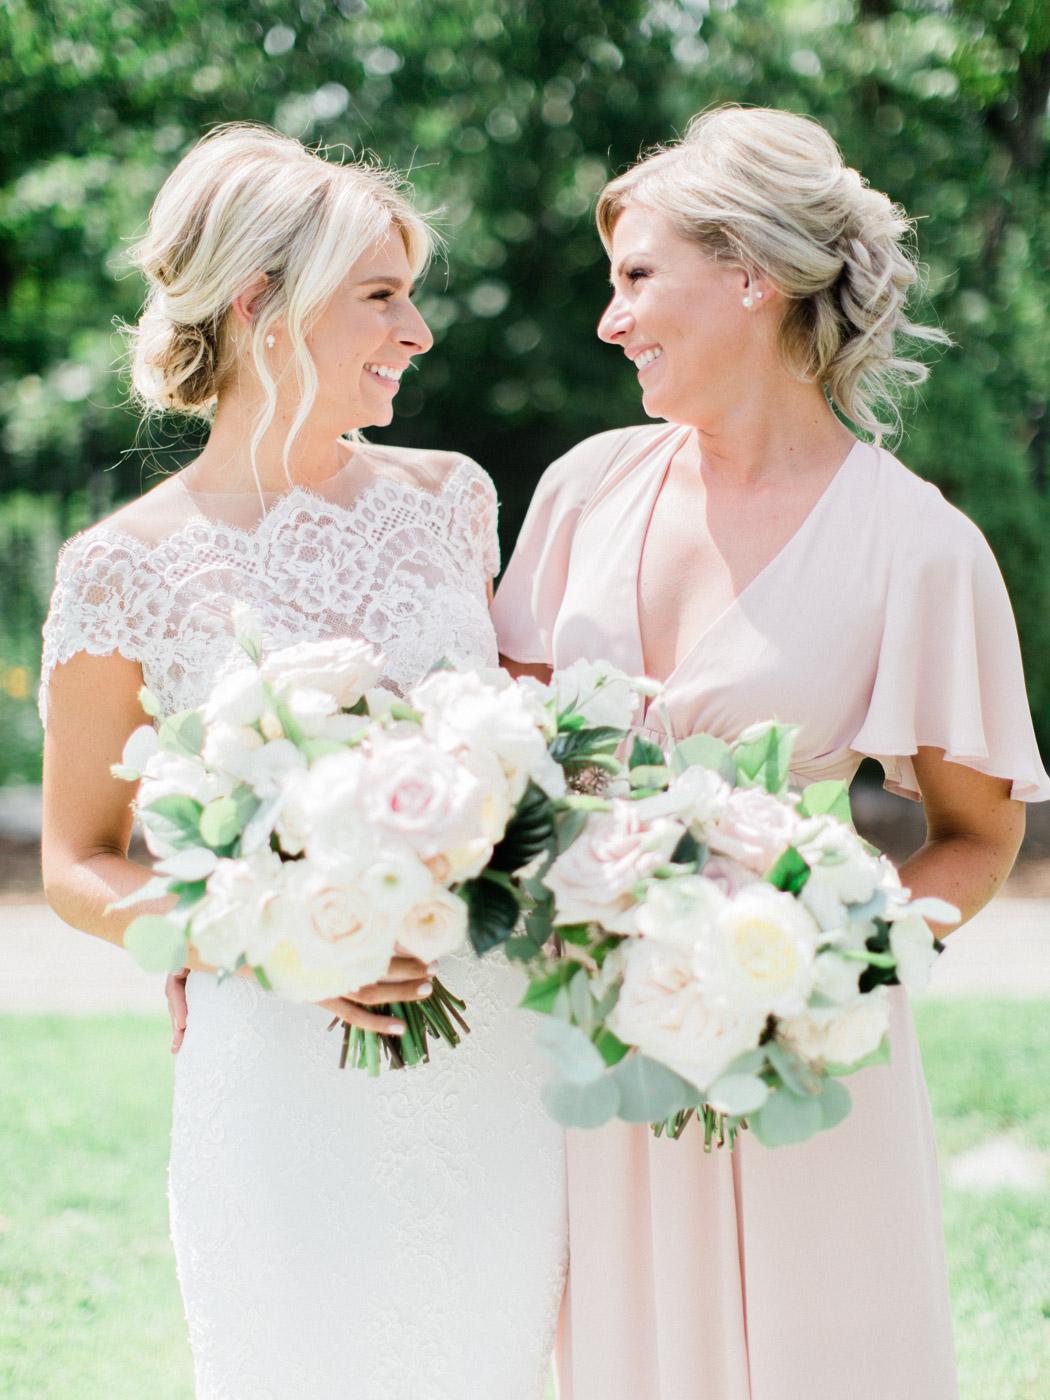 Toronto-Muskoka-wedding-photographer-summery-fun-documentary-the-marriott-rosseau43.jpg